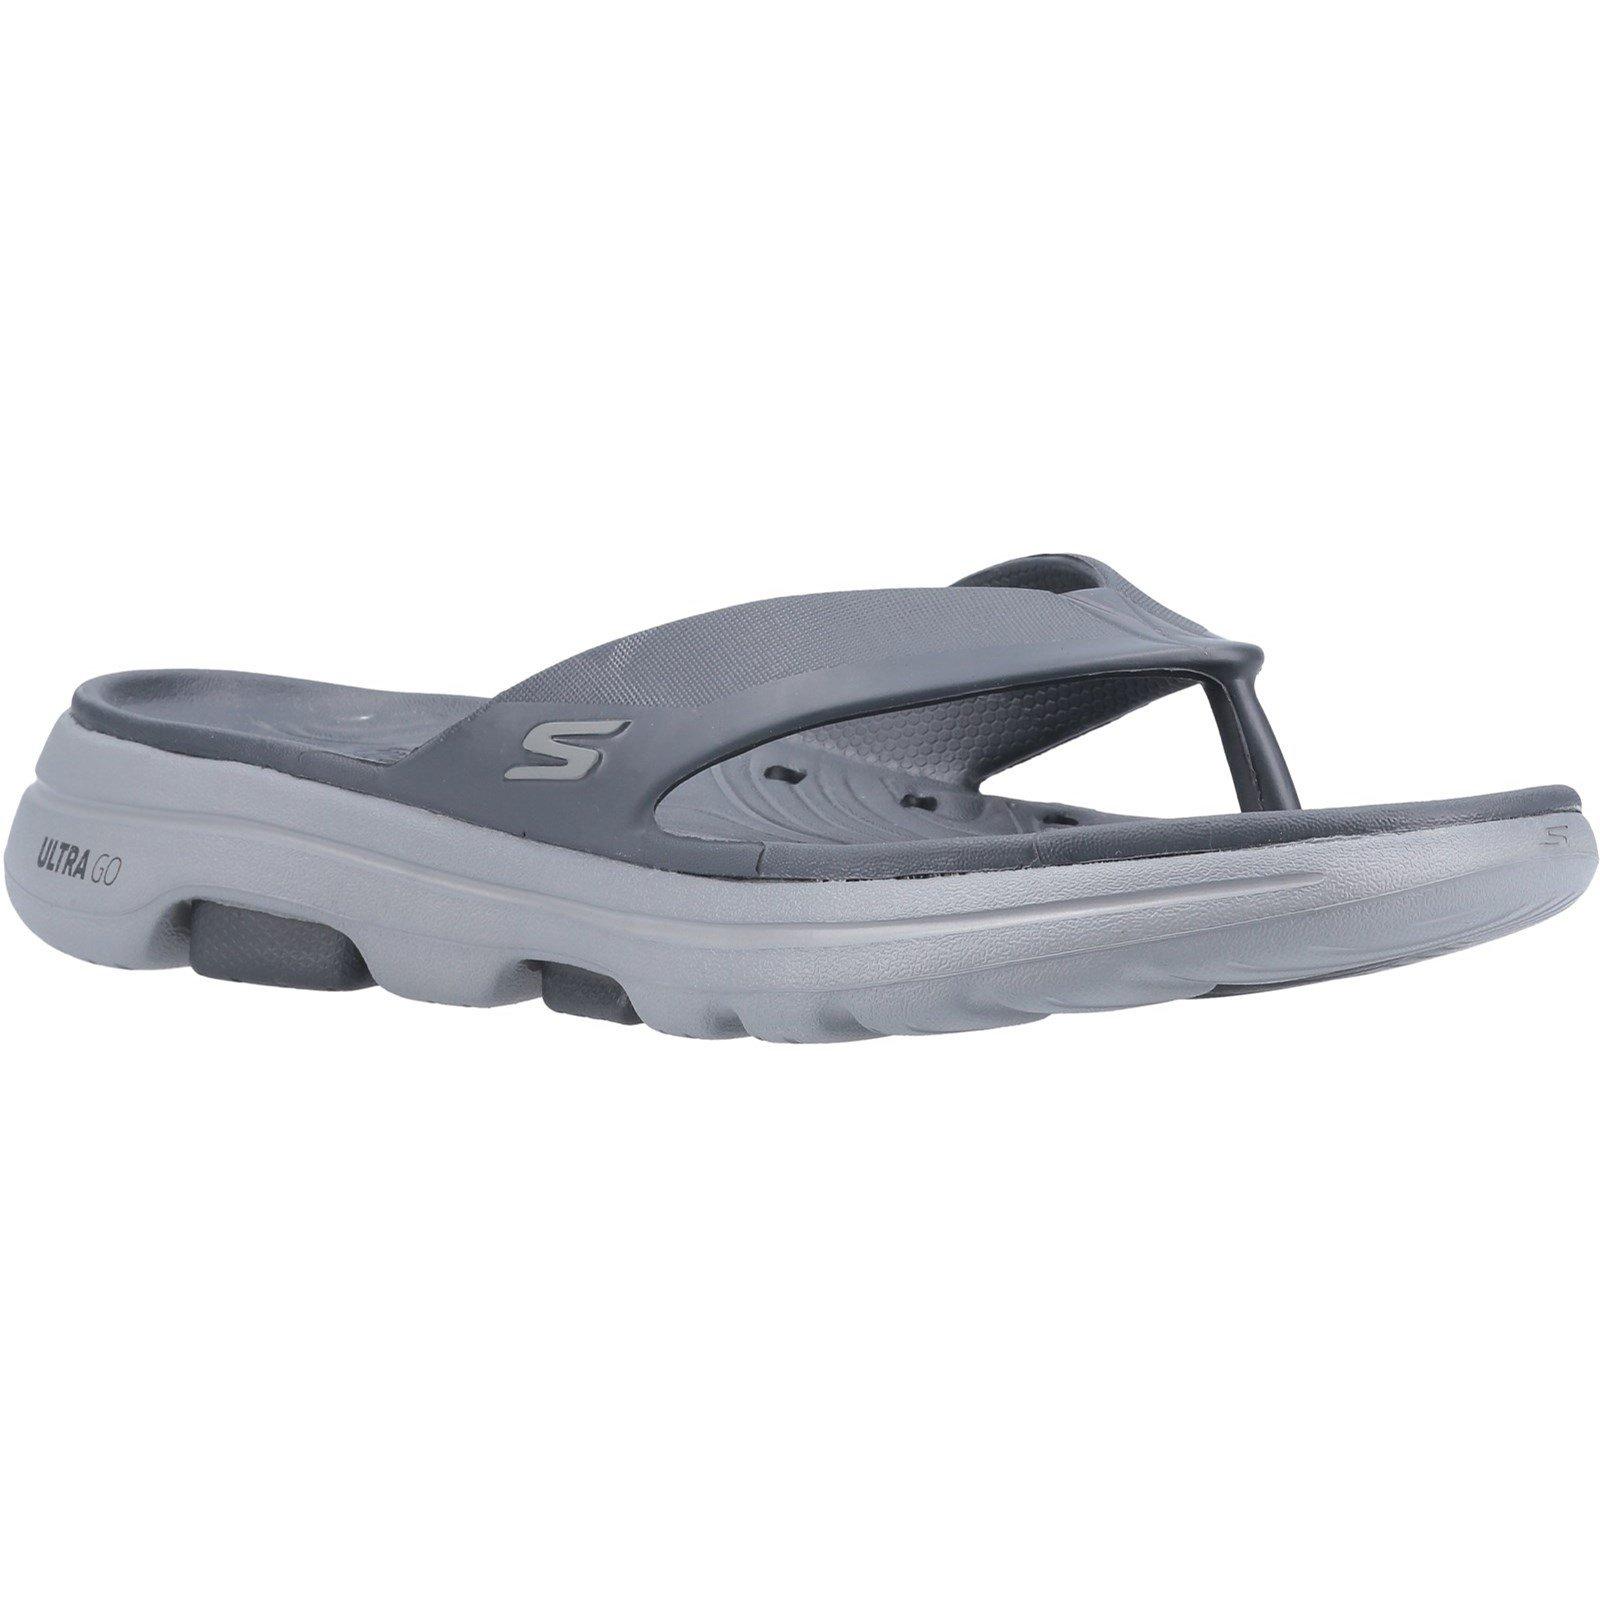 Skechers Men's GOwalk 5 Cabana Toe Post Sandal Charcoal 32207 - Charcoal 10